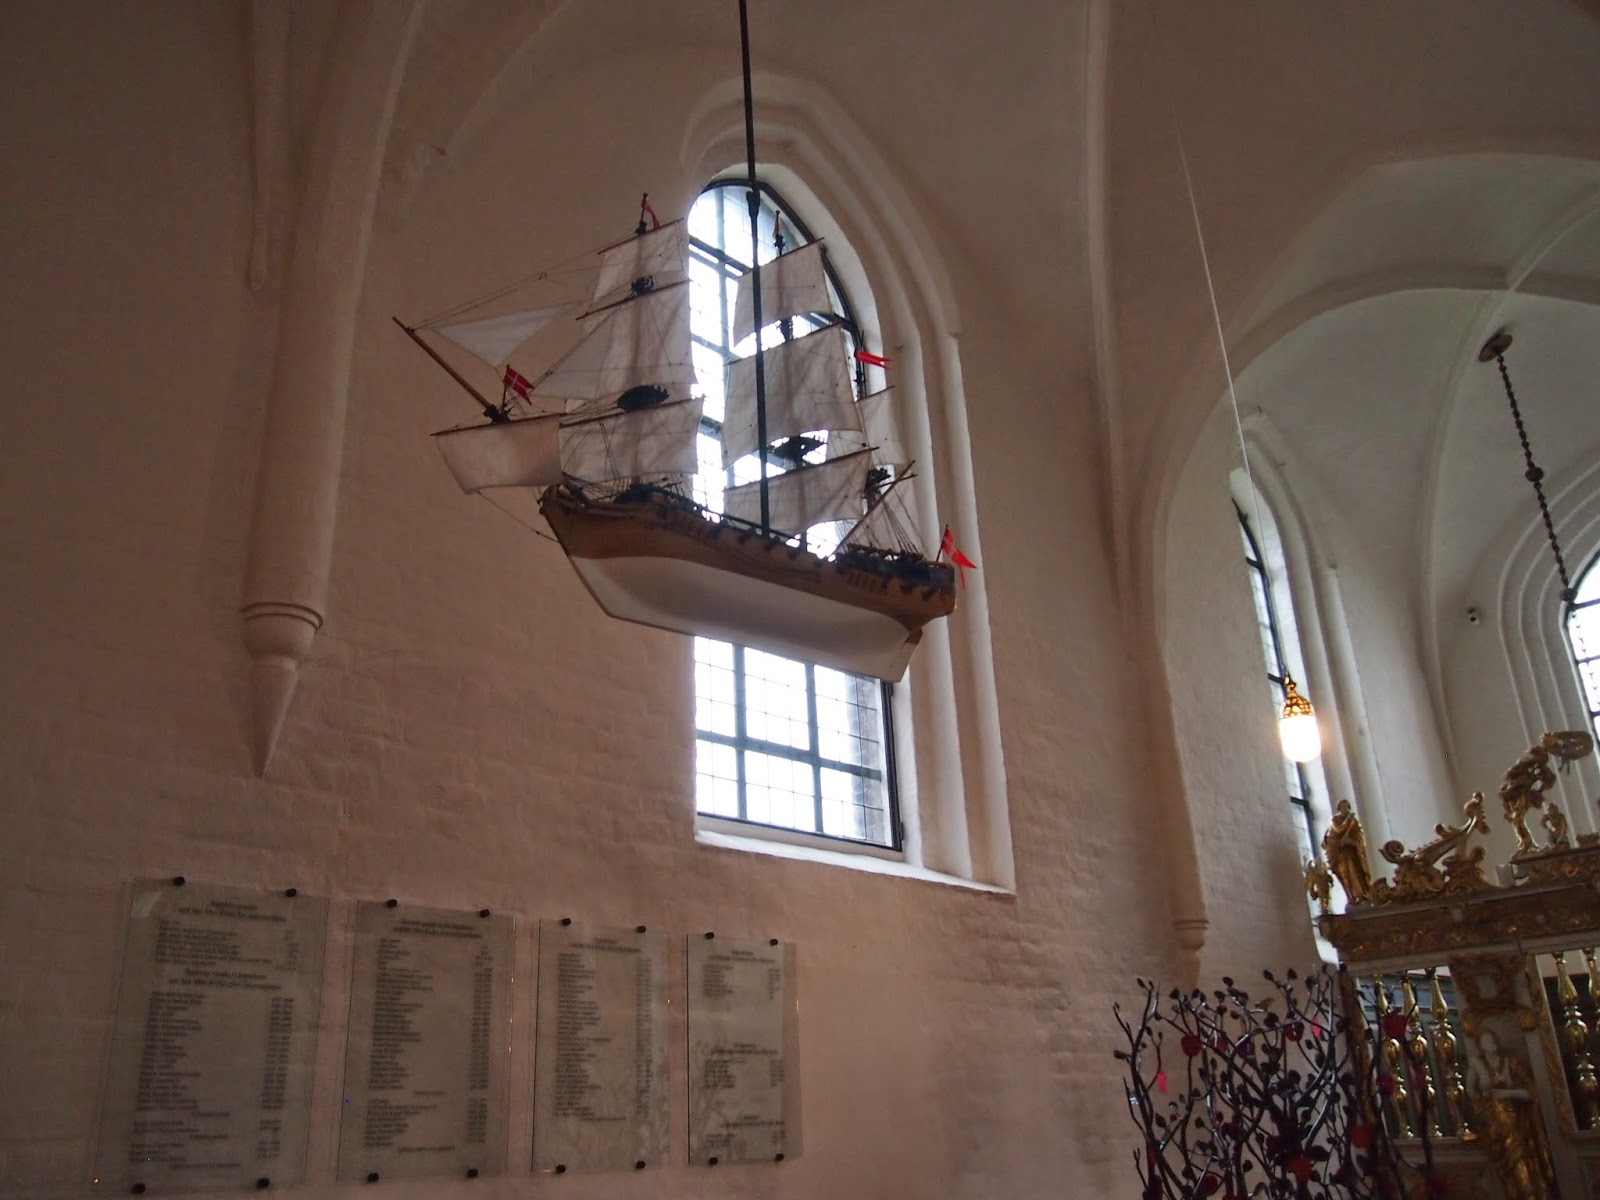 Maritime motifs in churches in Helsingor